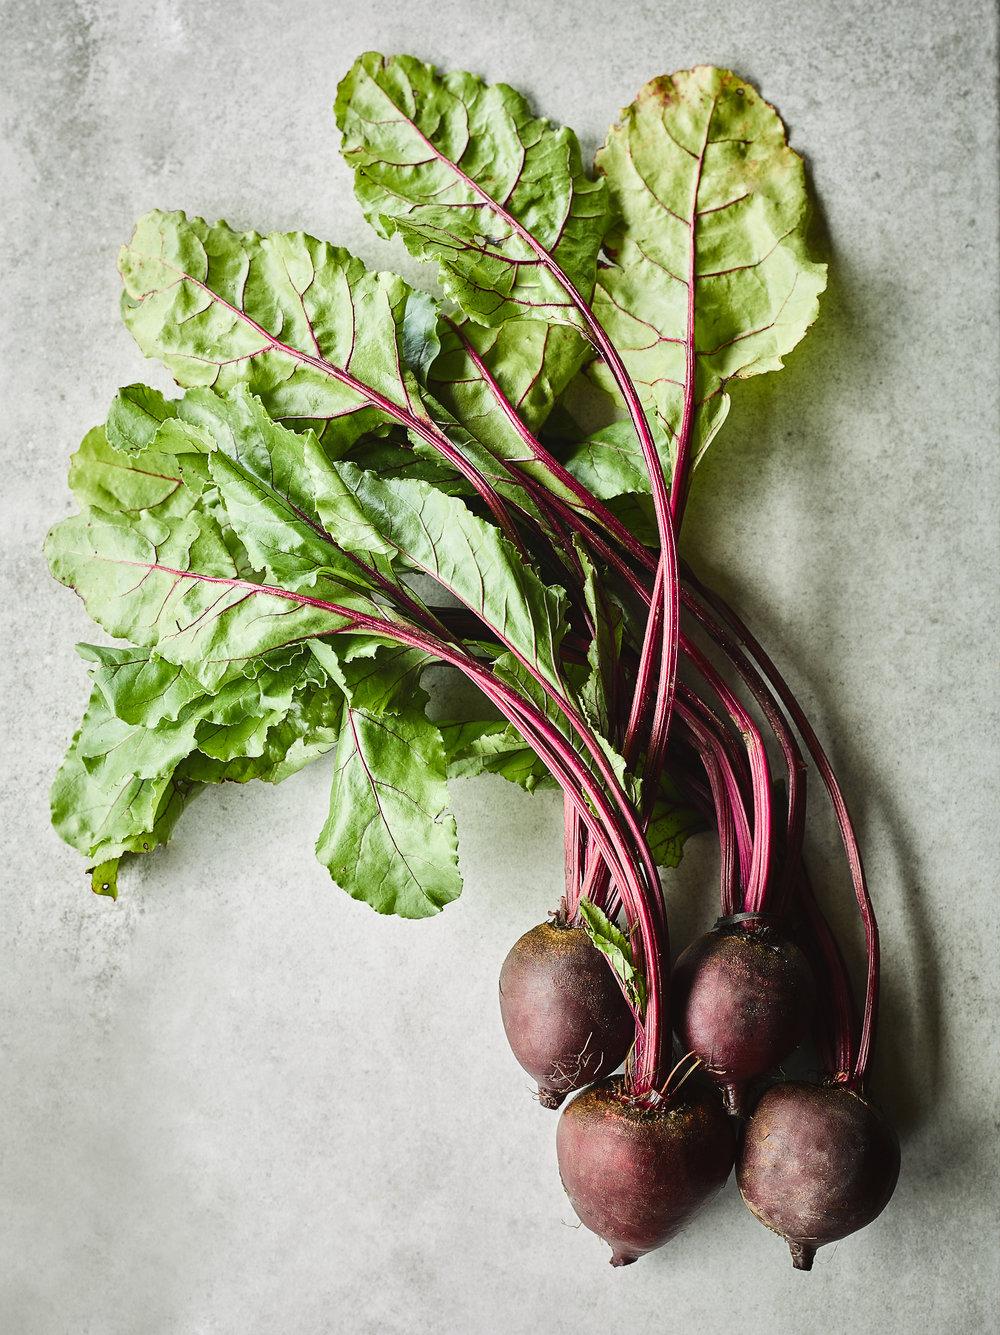 2016-0702 - Beet Salad 0056.jpg